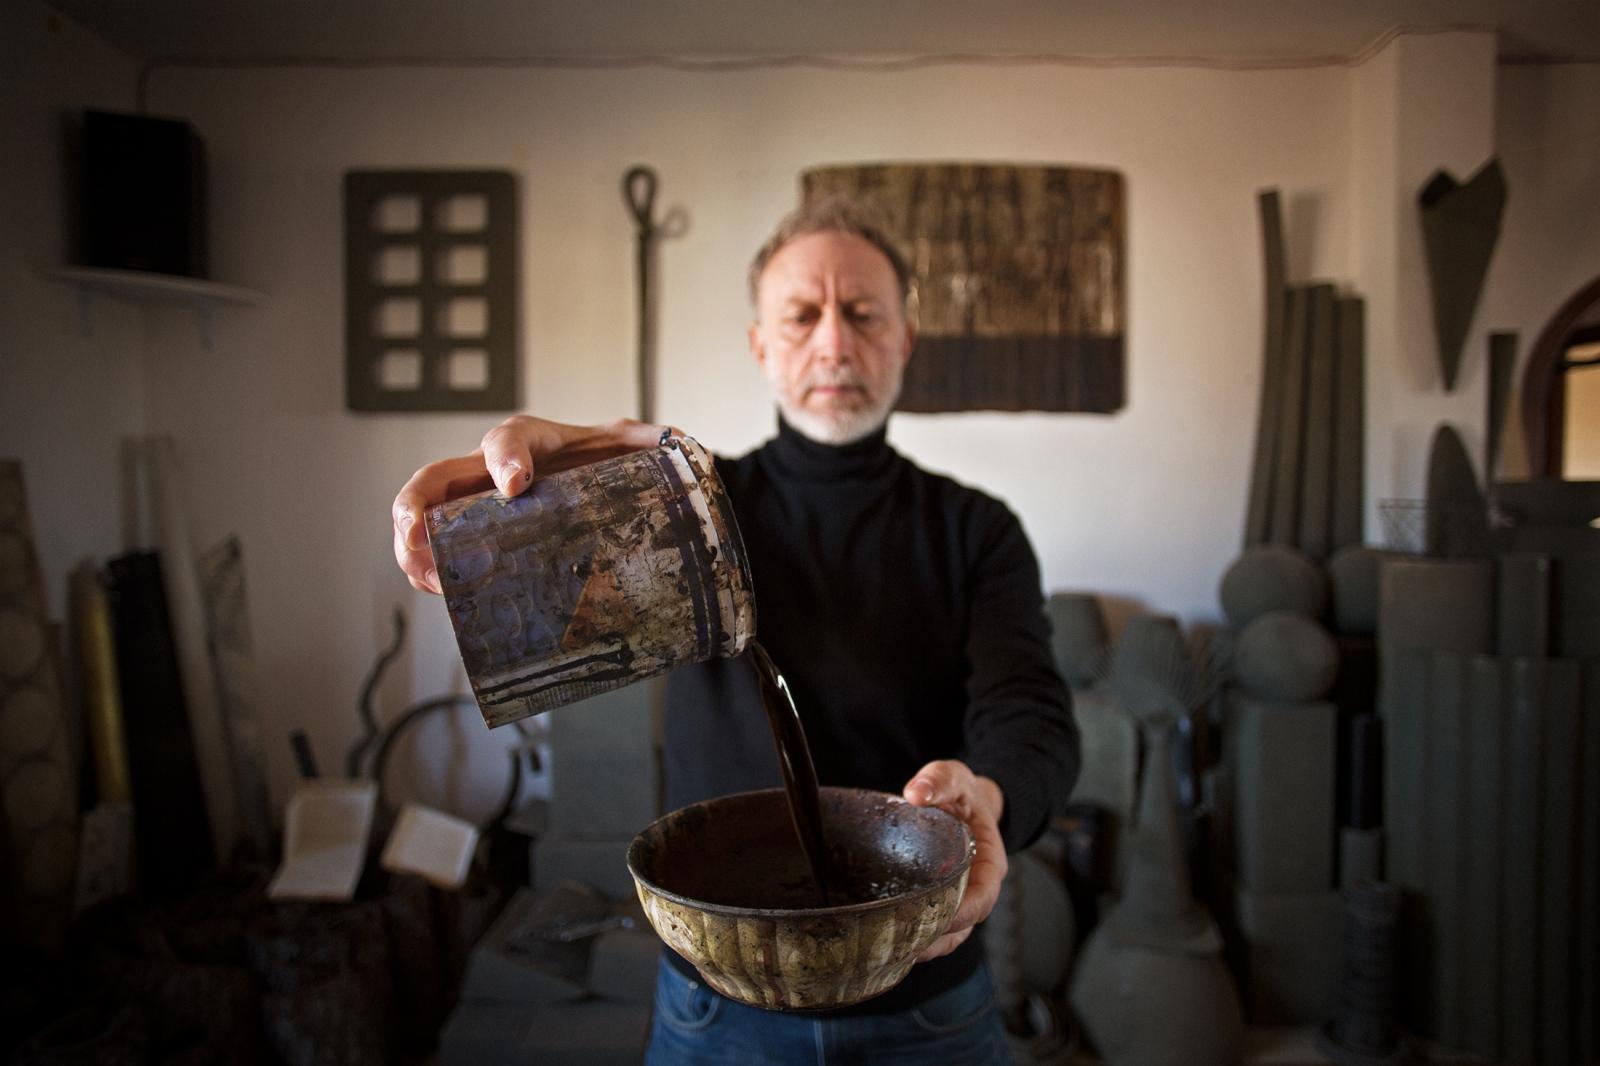 Maurizio MULTIMEDIA ARTIST